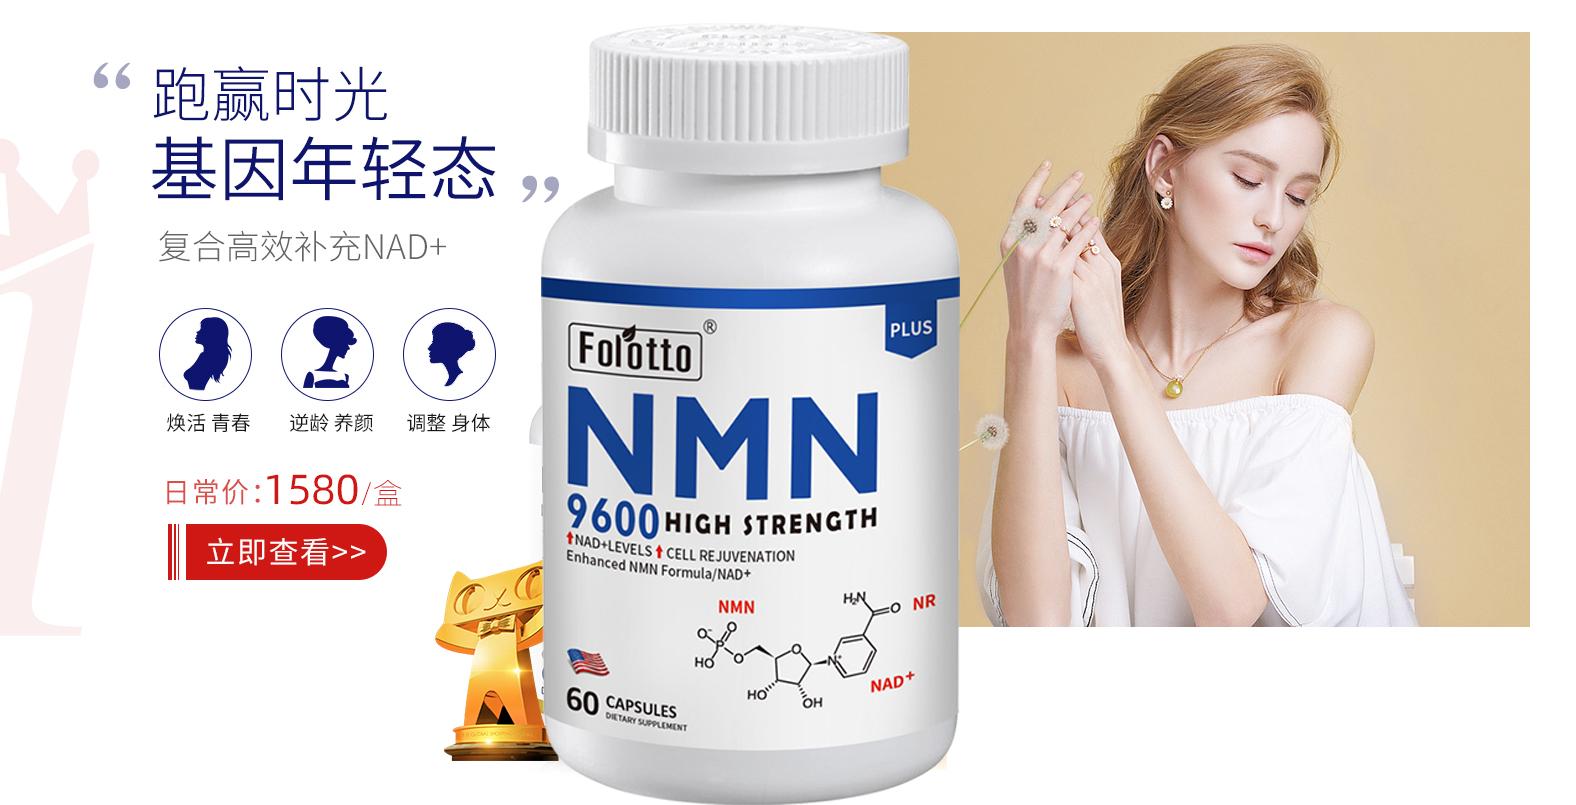 NMN的真实效果让你逆龄生长不是梦,NMN是什么药?插图